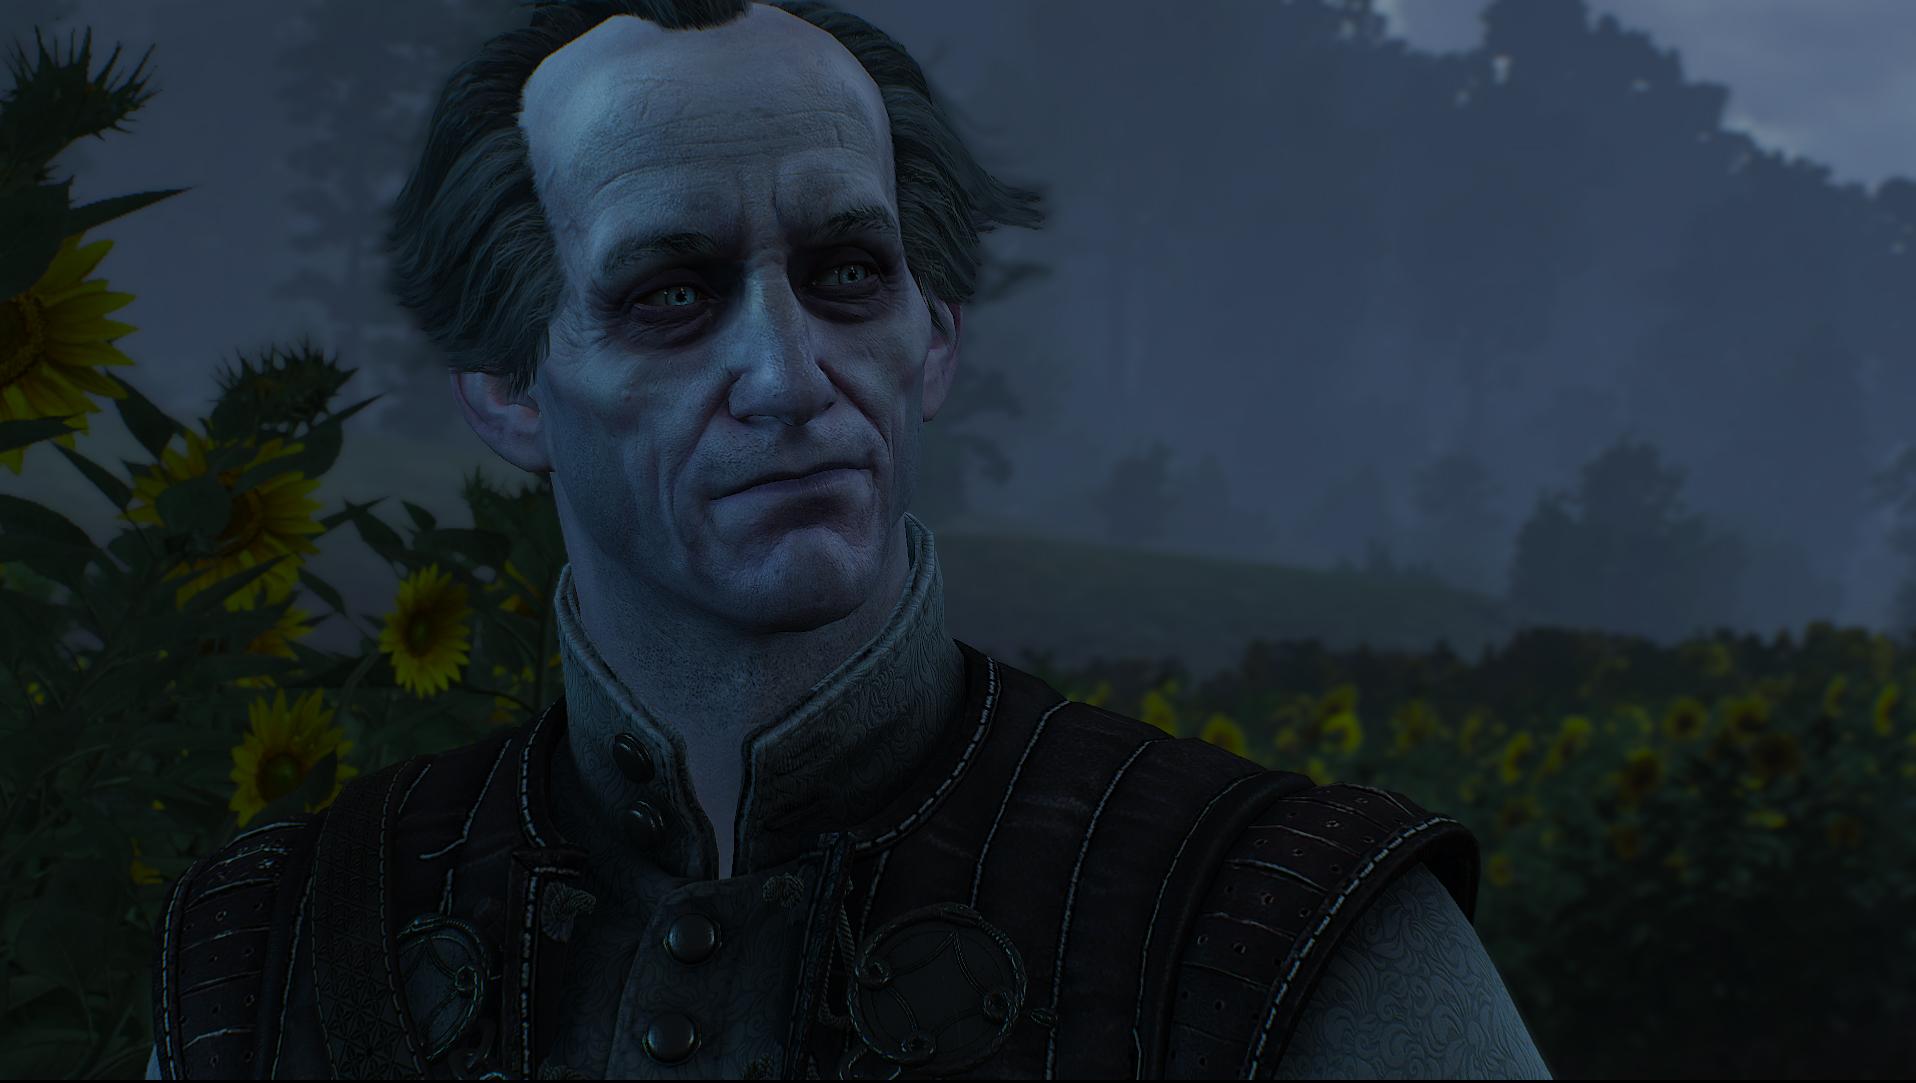 Новый мод The Witcher 3 ощутимо улучшает лица персонажей